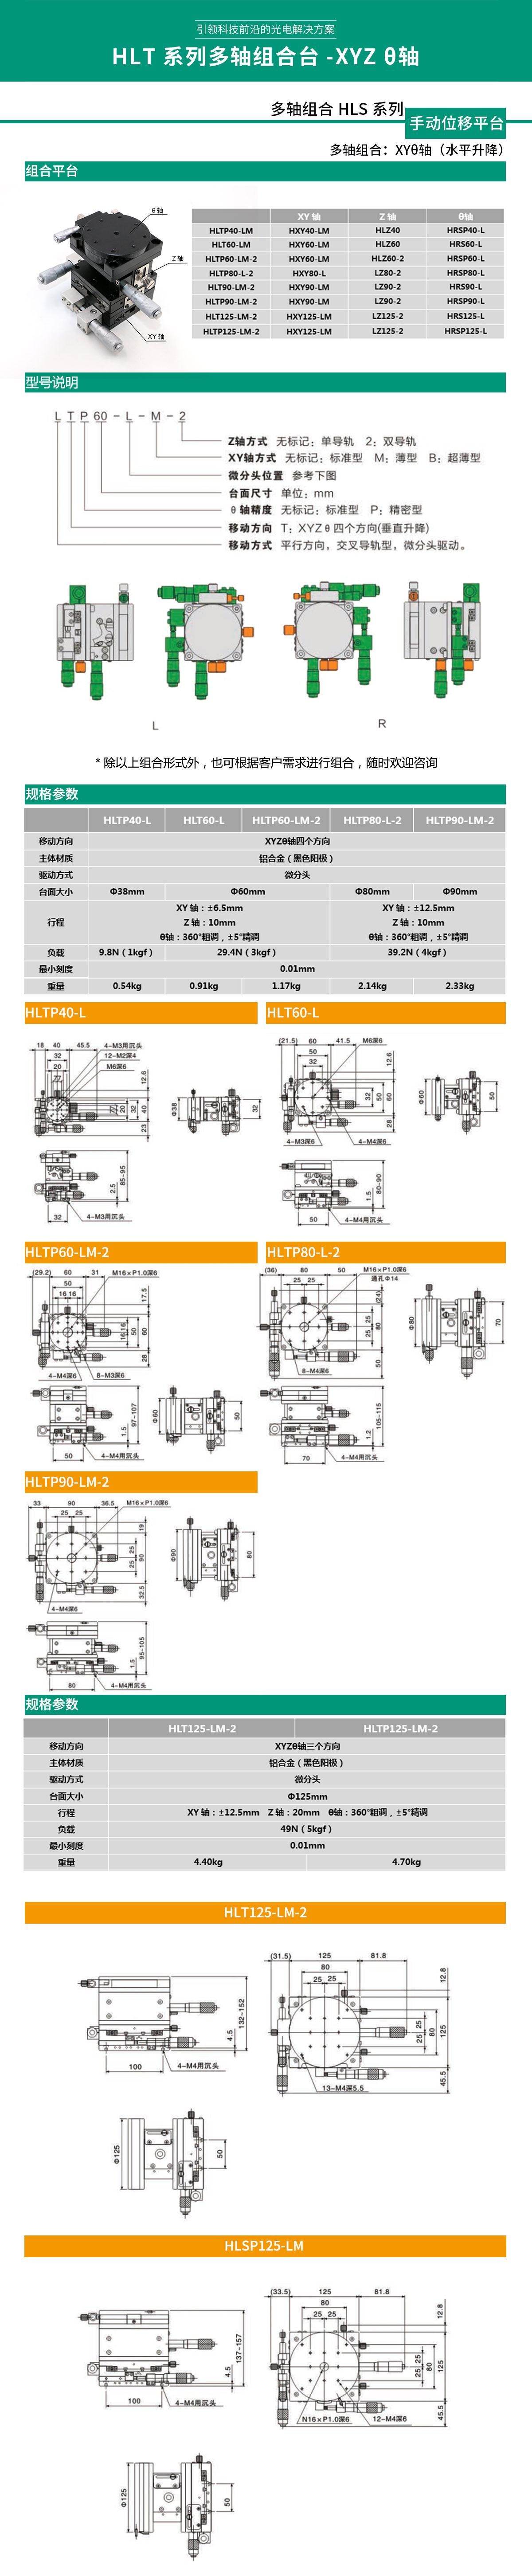 HLT系列多轴组合台-XYZ-θ轴